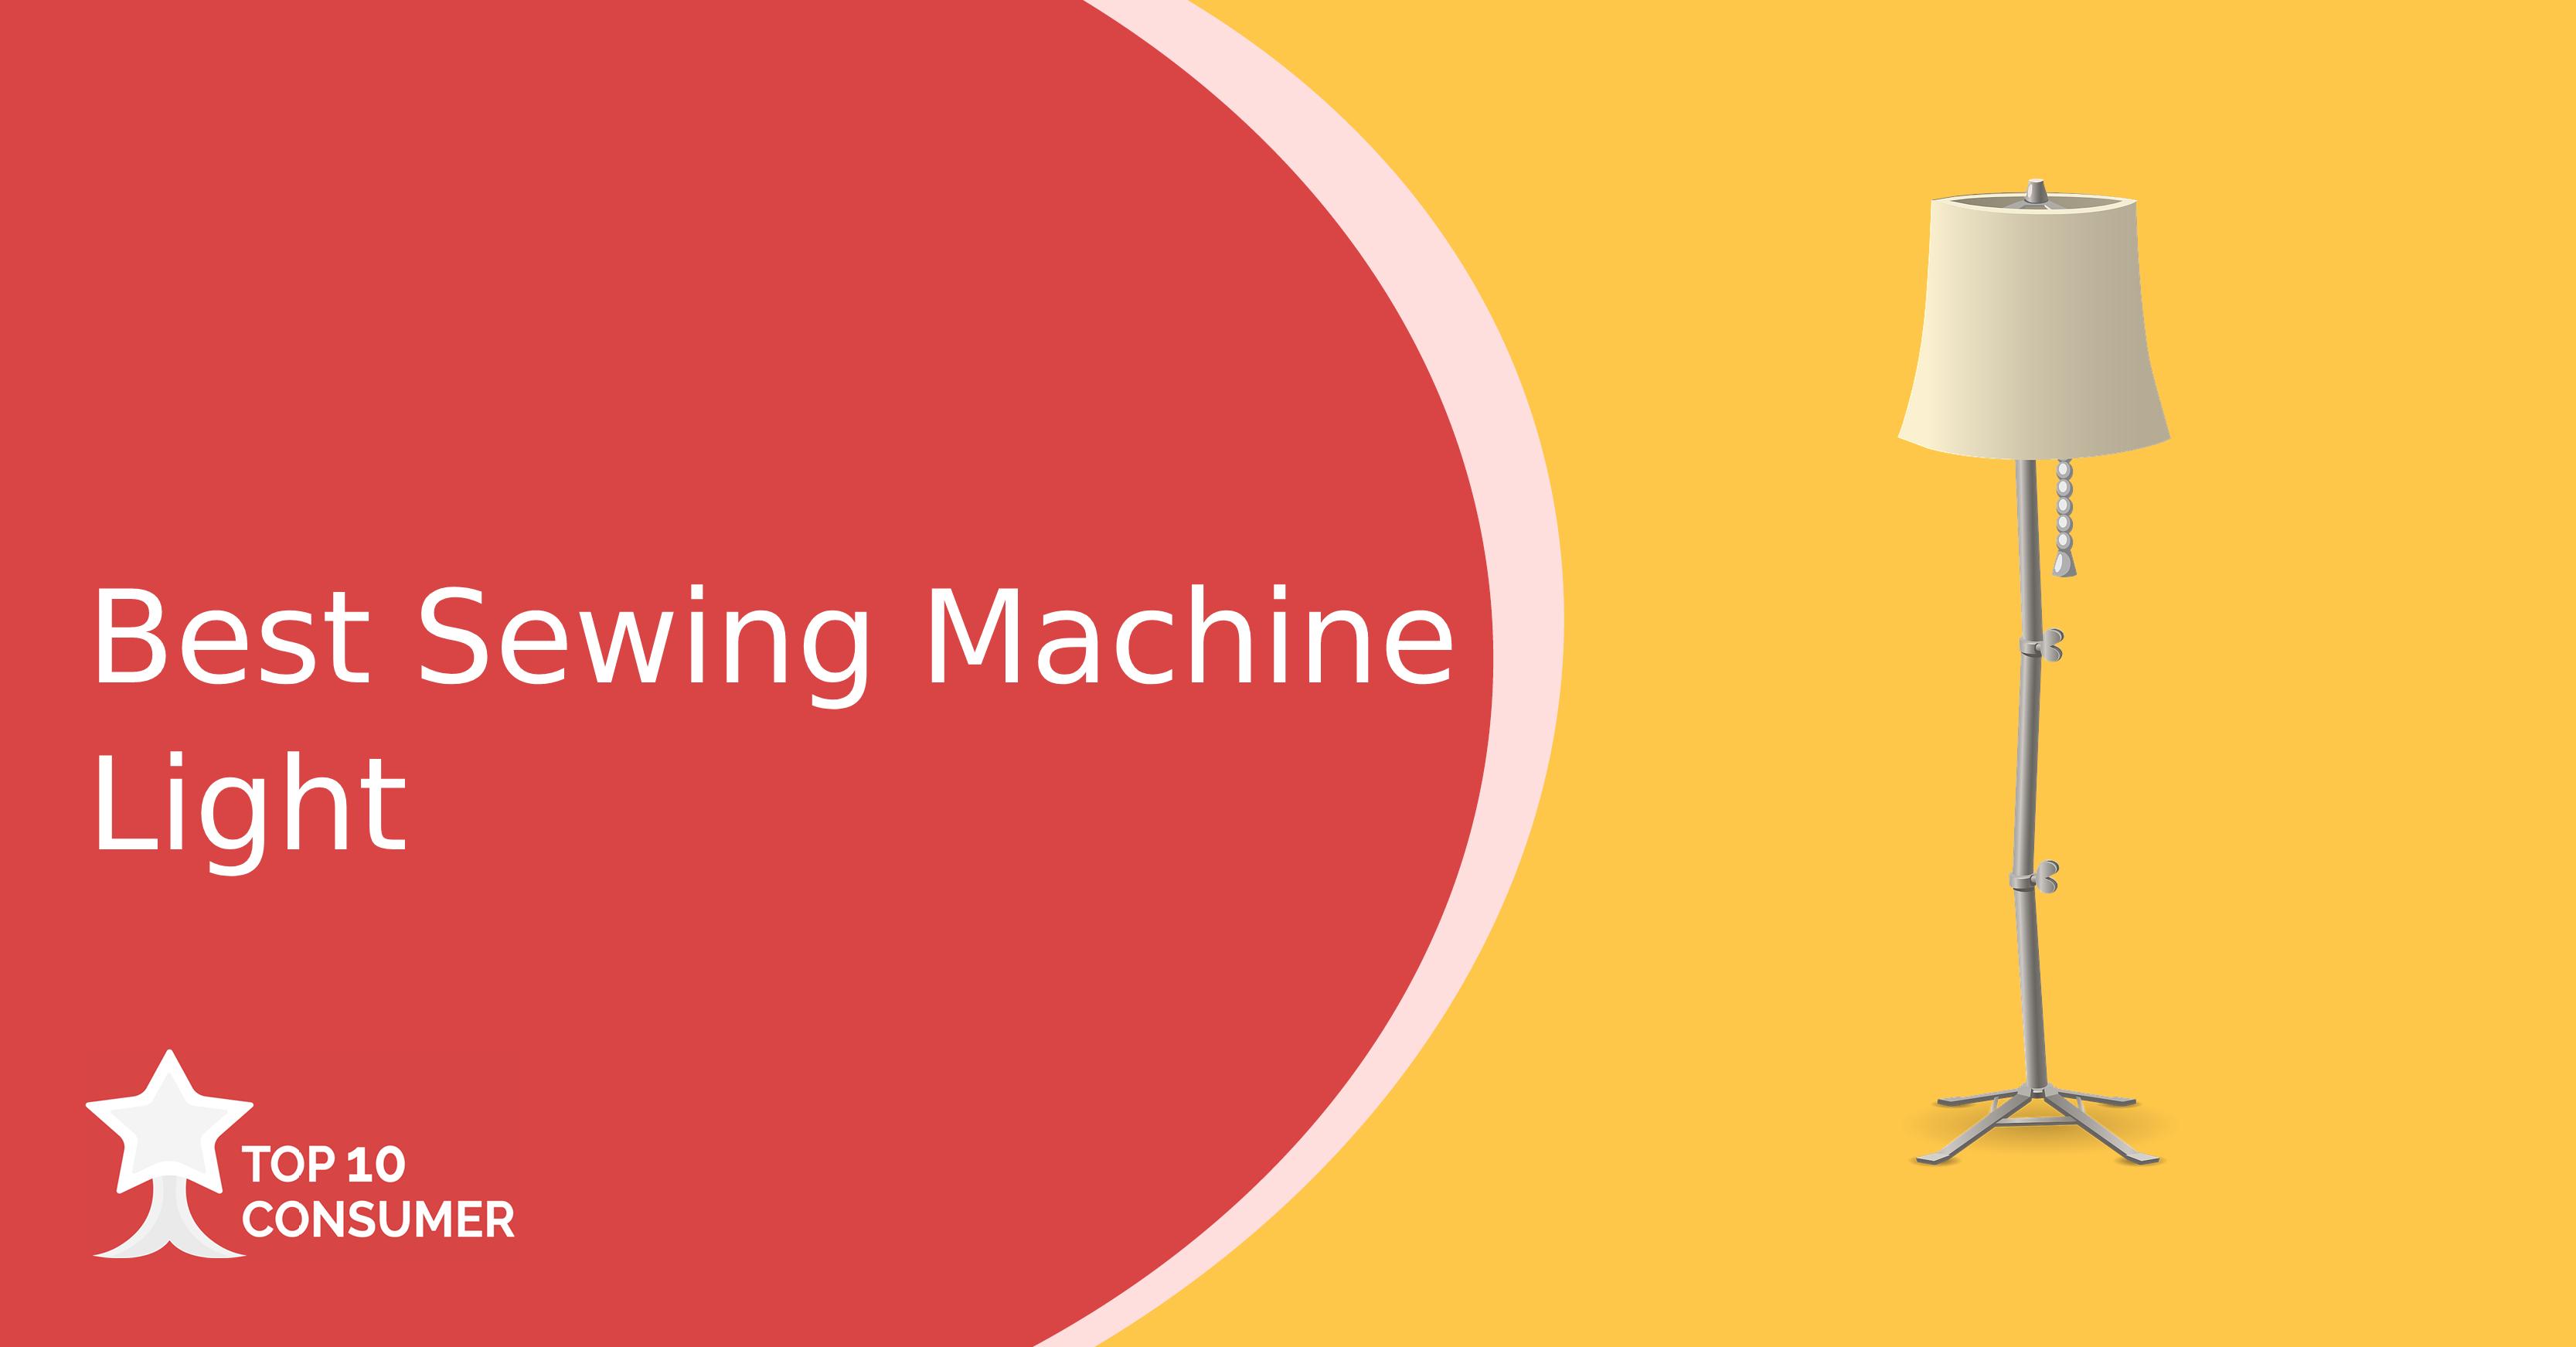 Best Sewing Machine Light